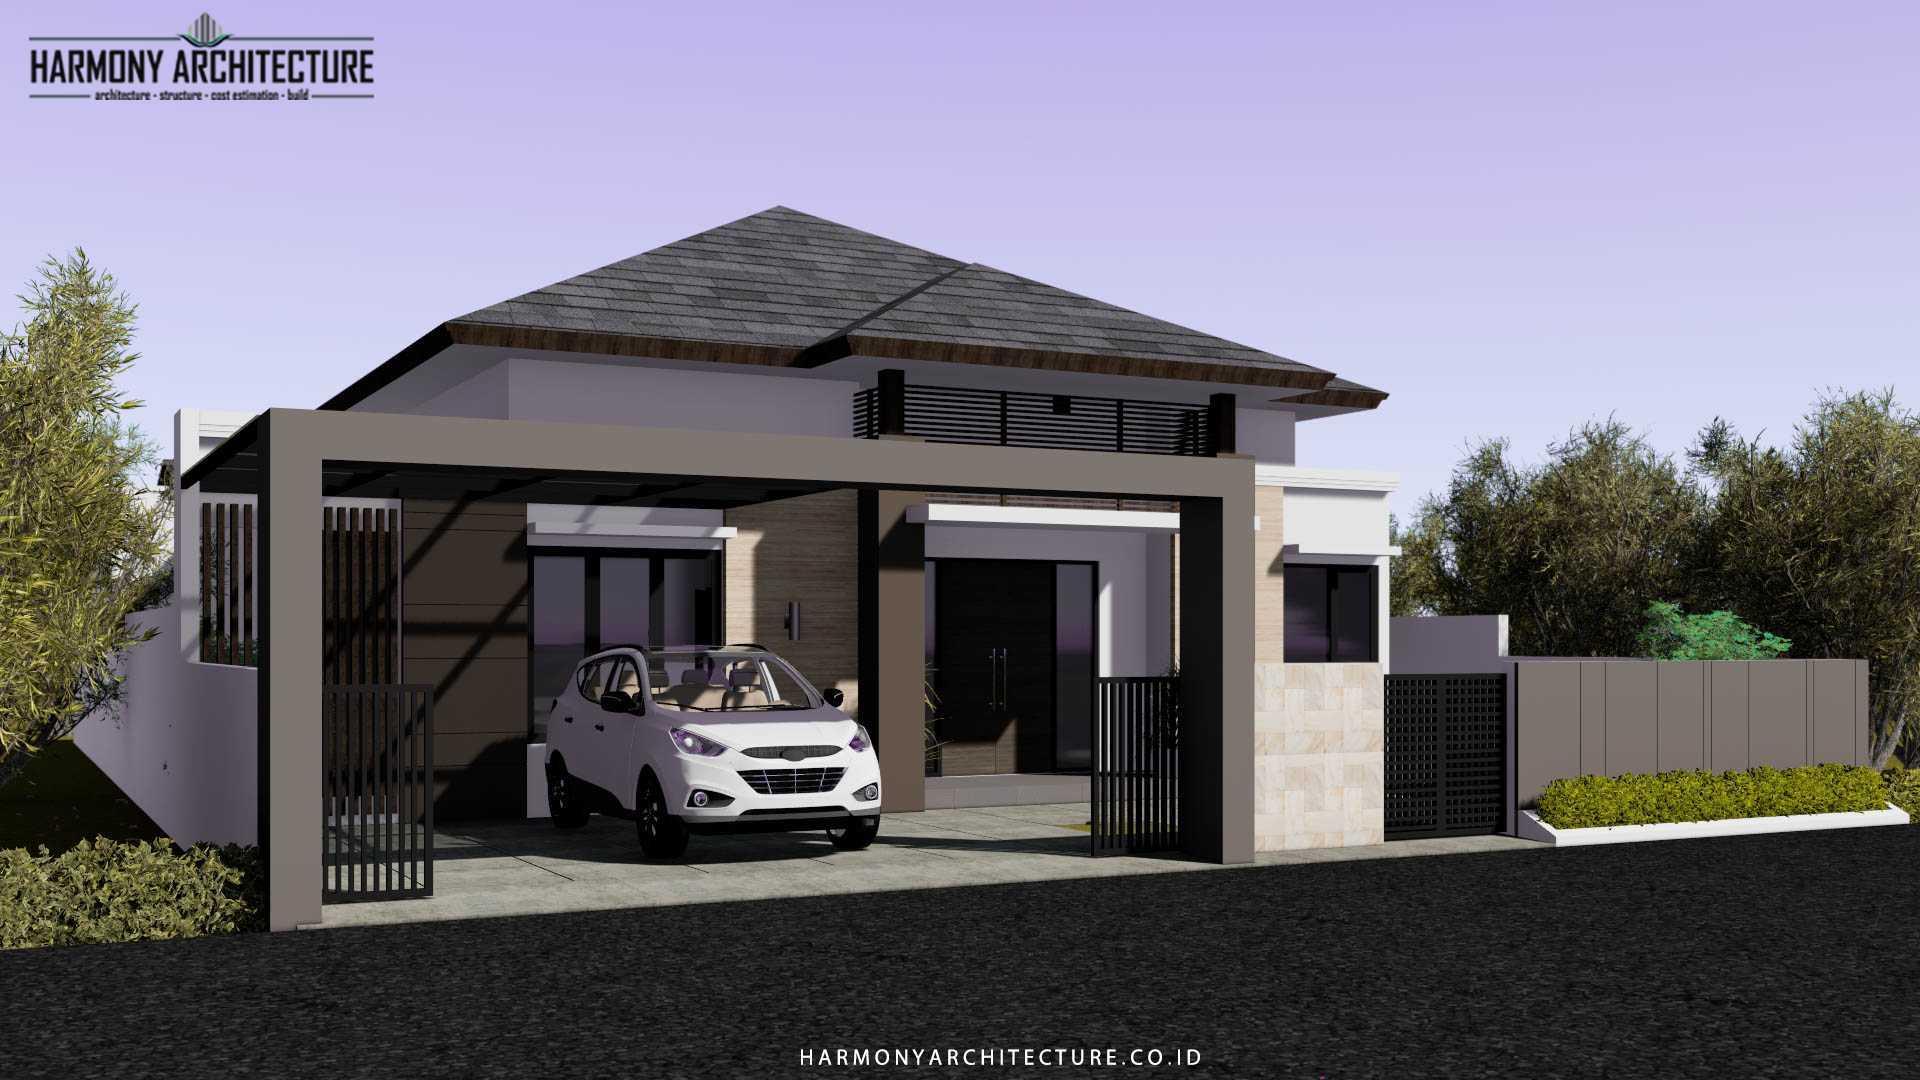 Harmony Architecture Desain Rumah Bapak Ade Pulau Nias, Sumatera Utara, Indonesia Pulau Nias, Sumatera Utara, Indonesia Harmony-Architecture-Desain-Rumah-Bapak-Ade   91270